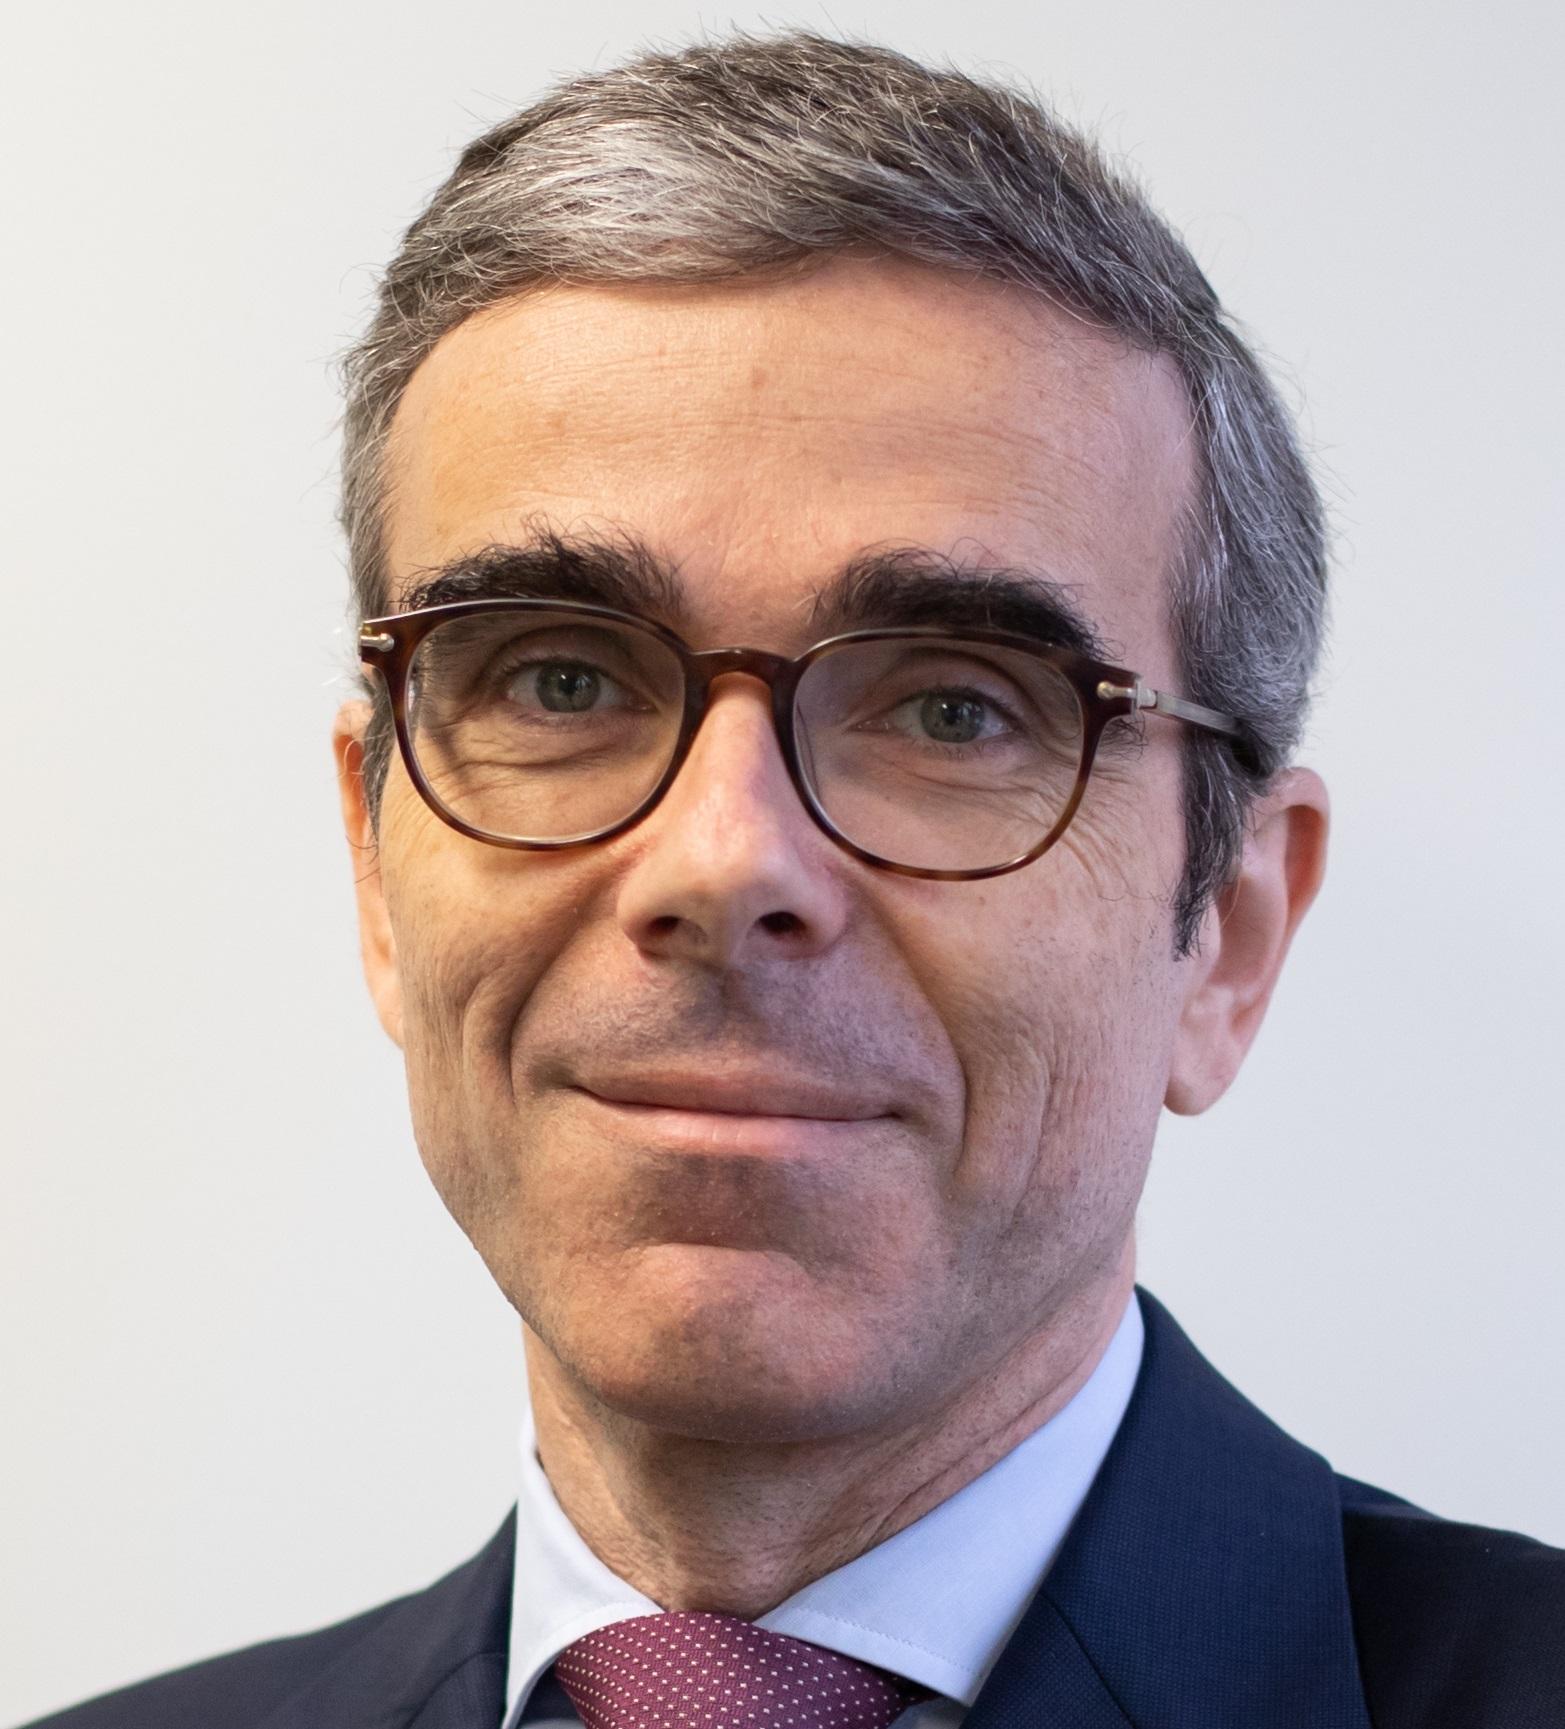 Frederico Mondril, Associate Director de Propety Management na consultora CBRE / CBRE